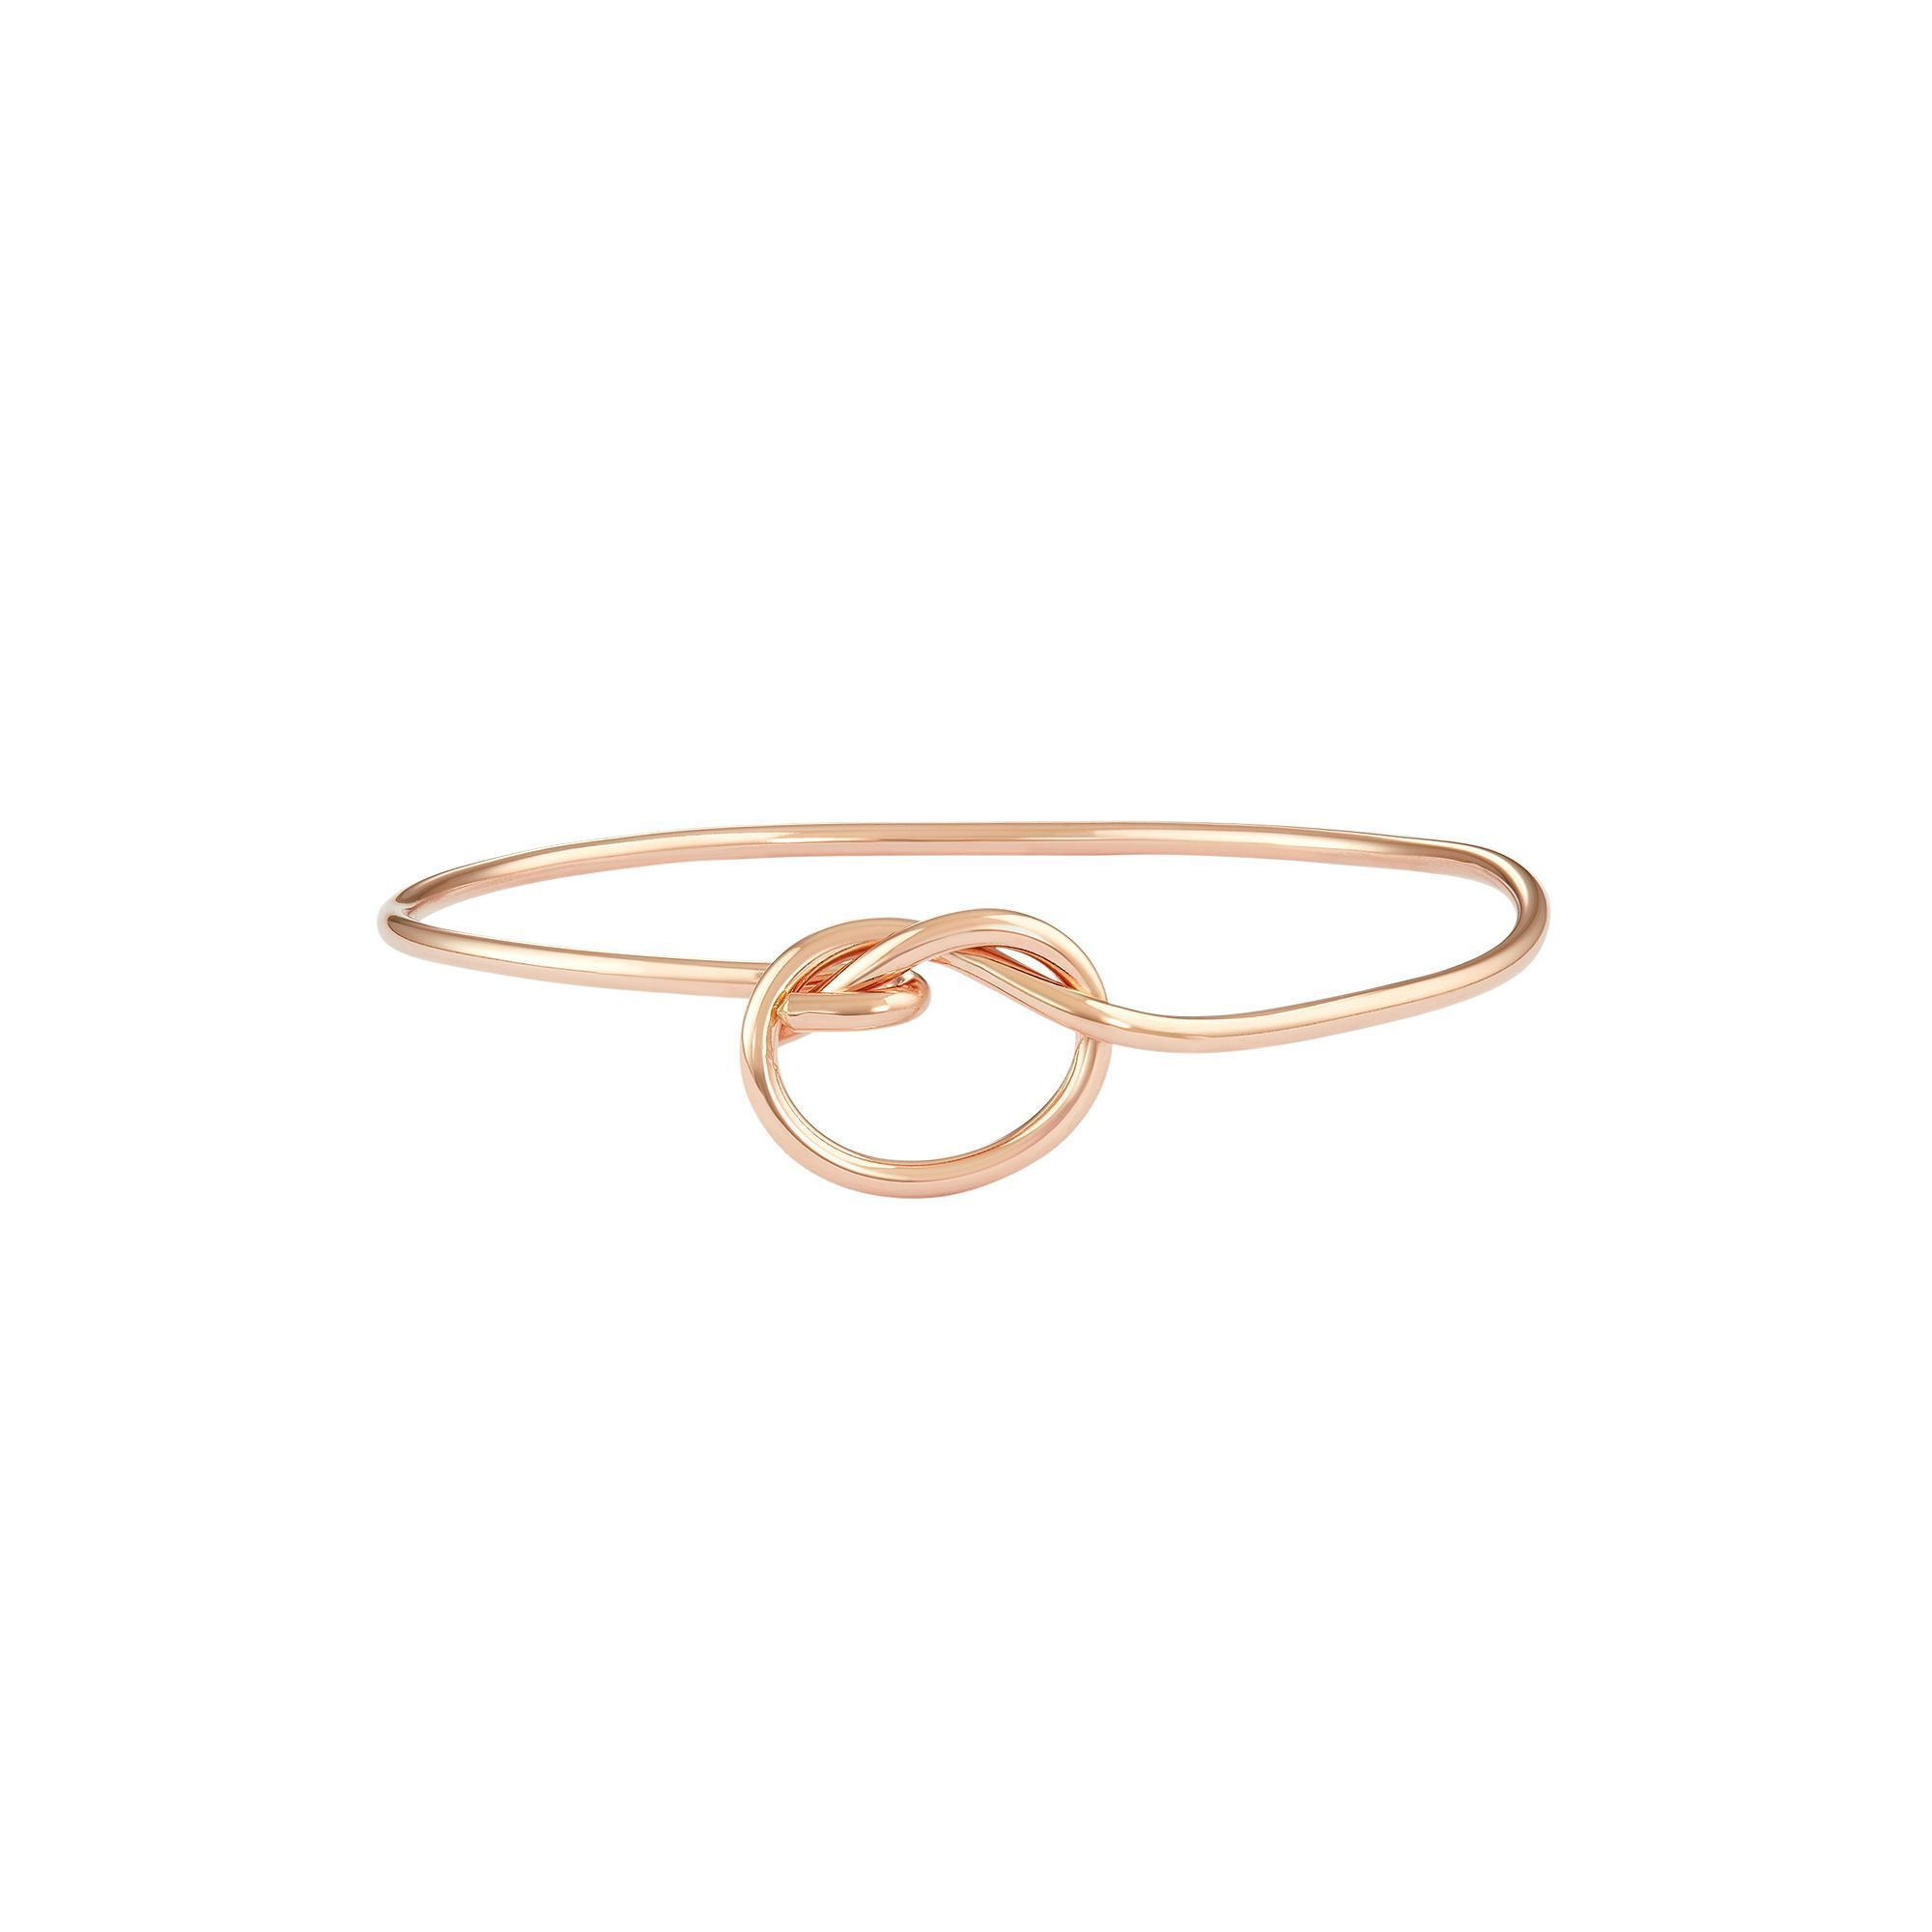 Journee collection sterling silver love knot bangle bracelet